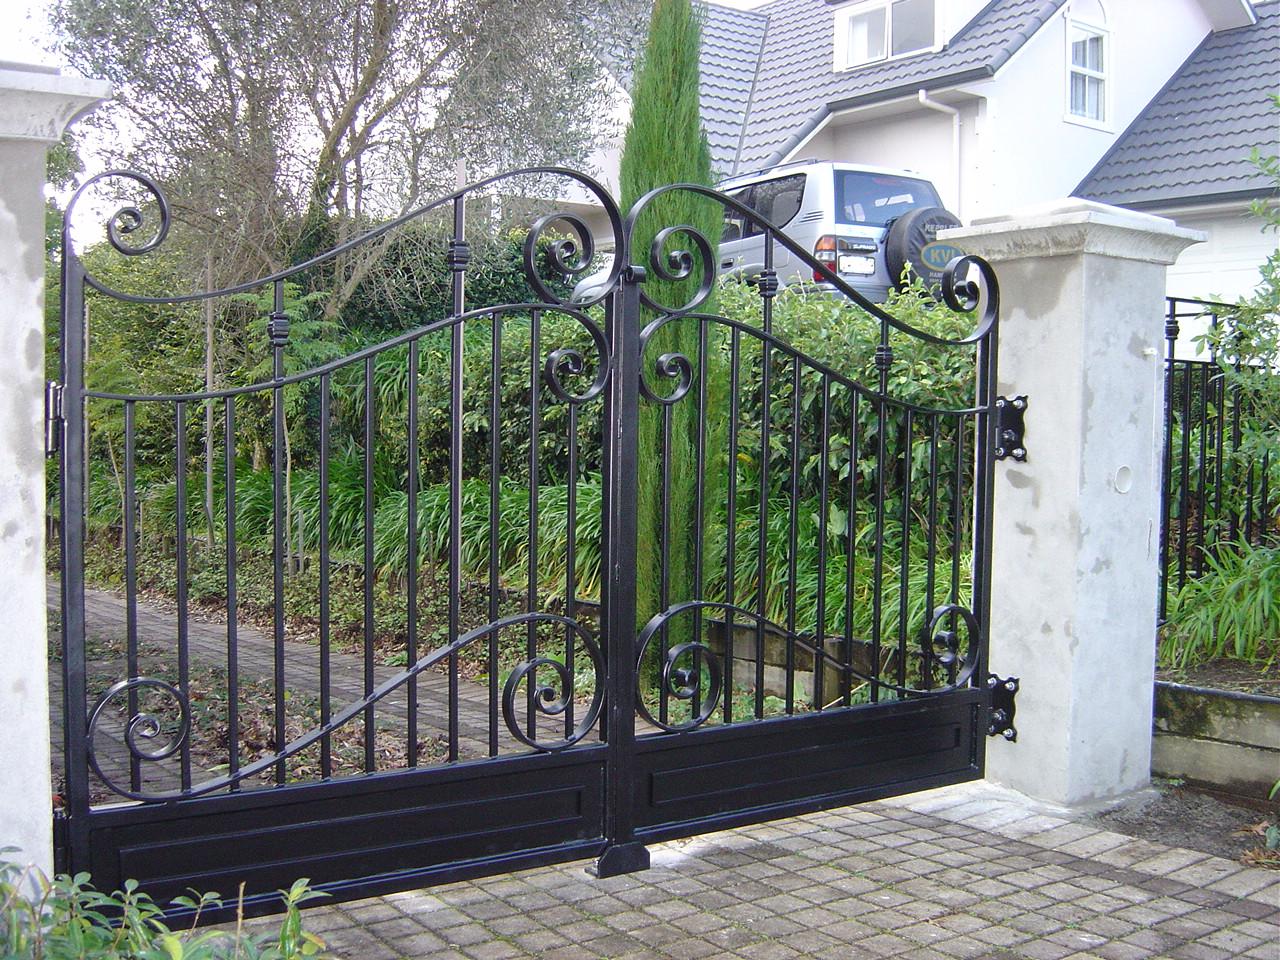 The problem with sliding gates